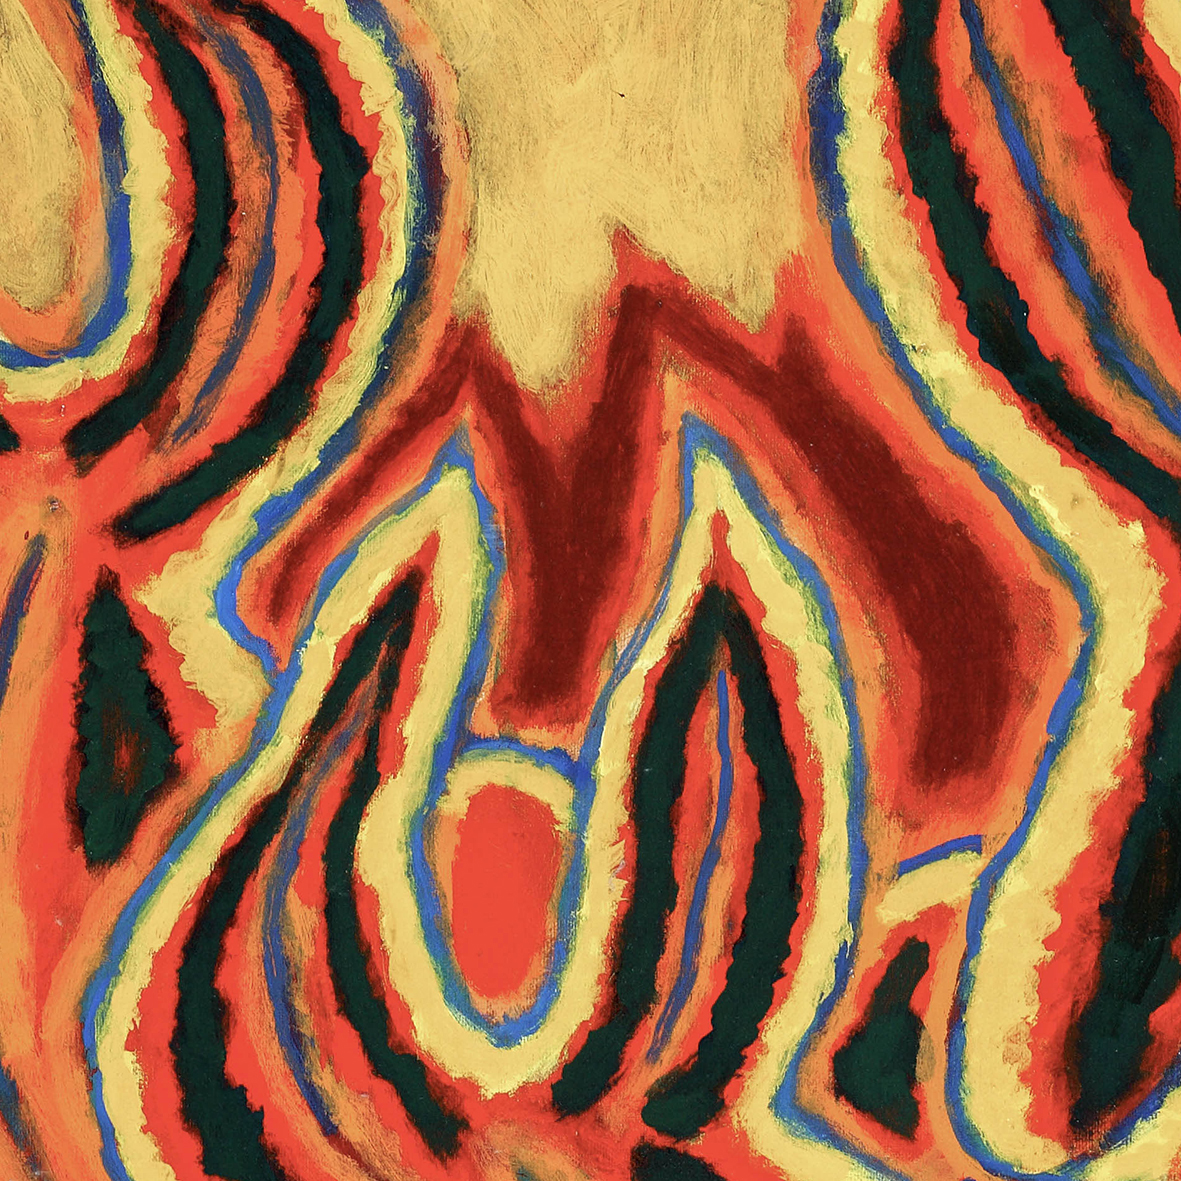 Nashar, Irama Alam (Nature's Rhythm), oil on canvas, 61 x 91.5 cm, 1993 (detail)